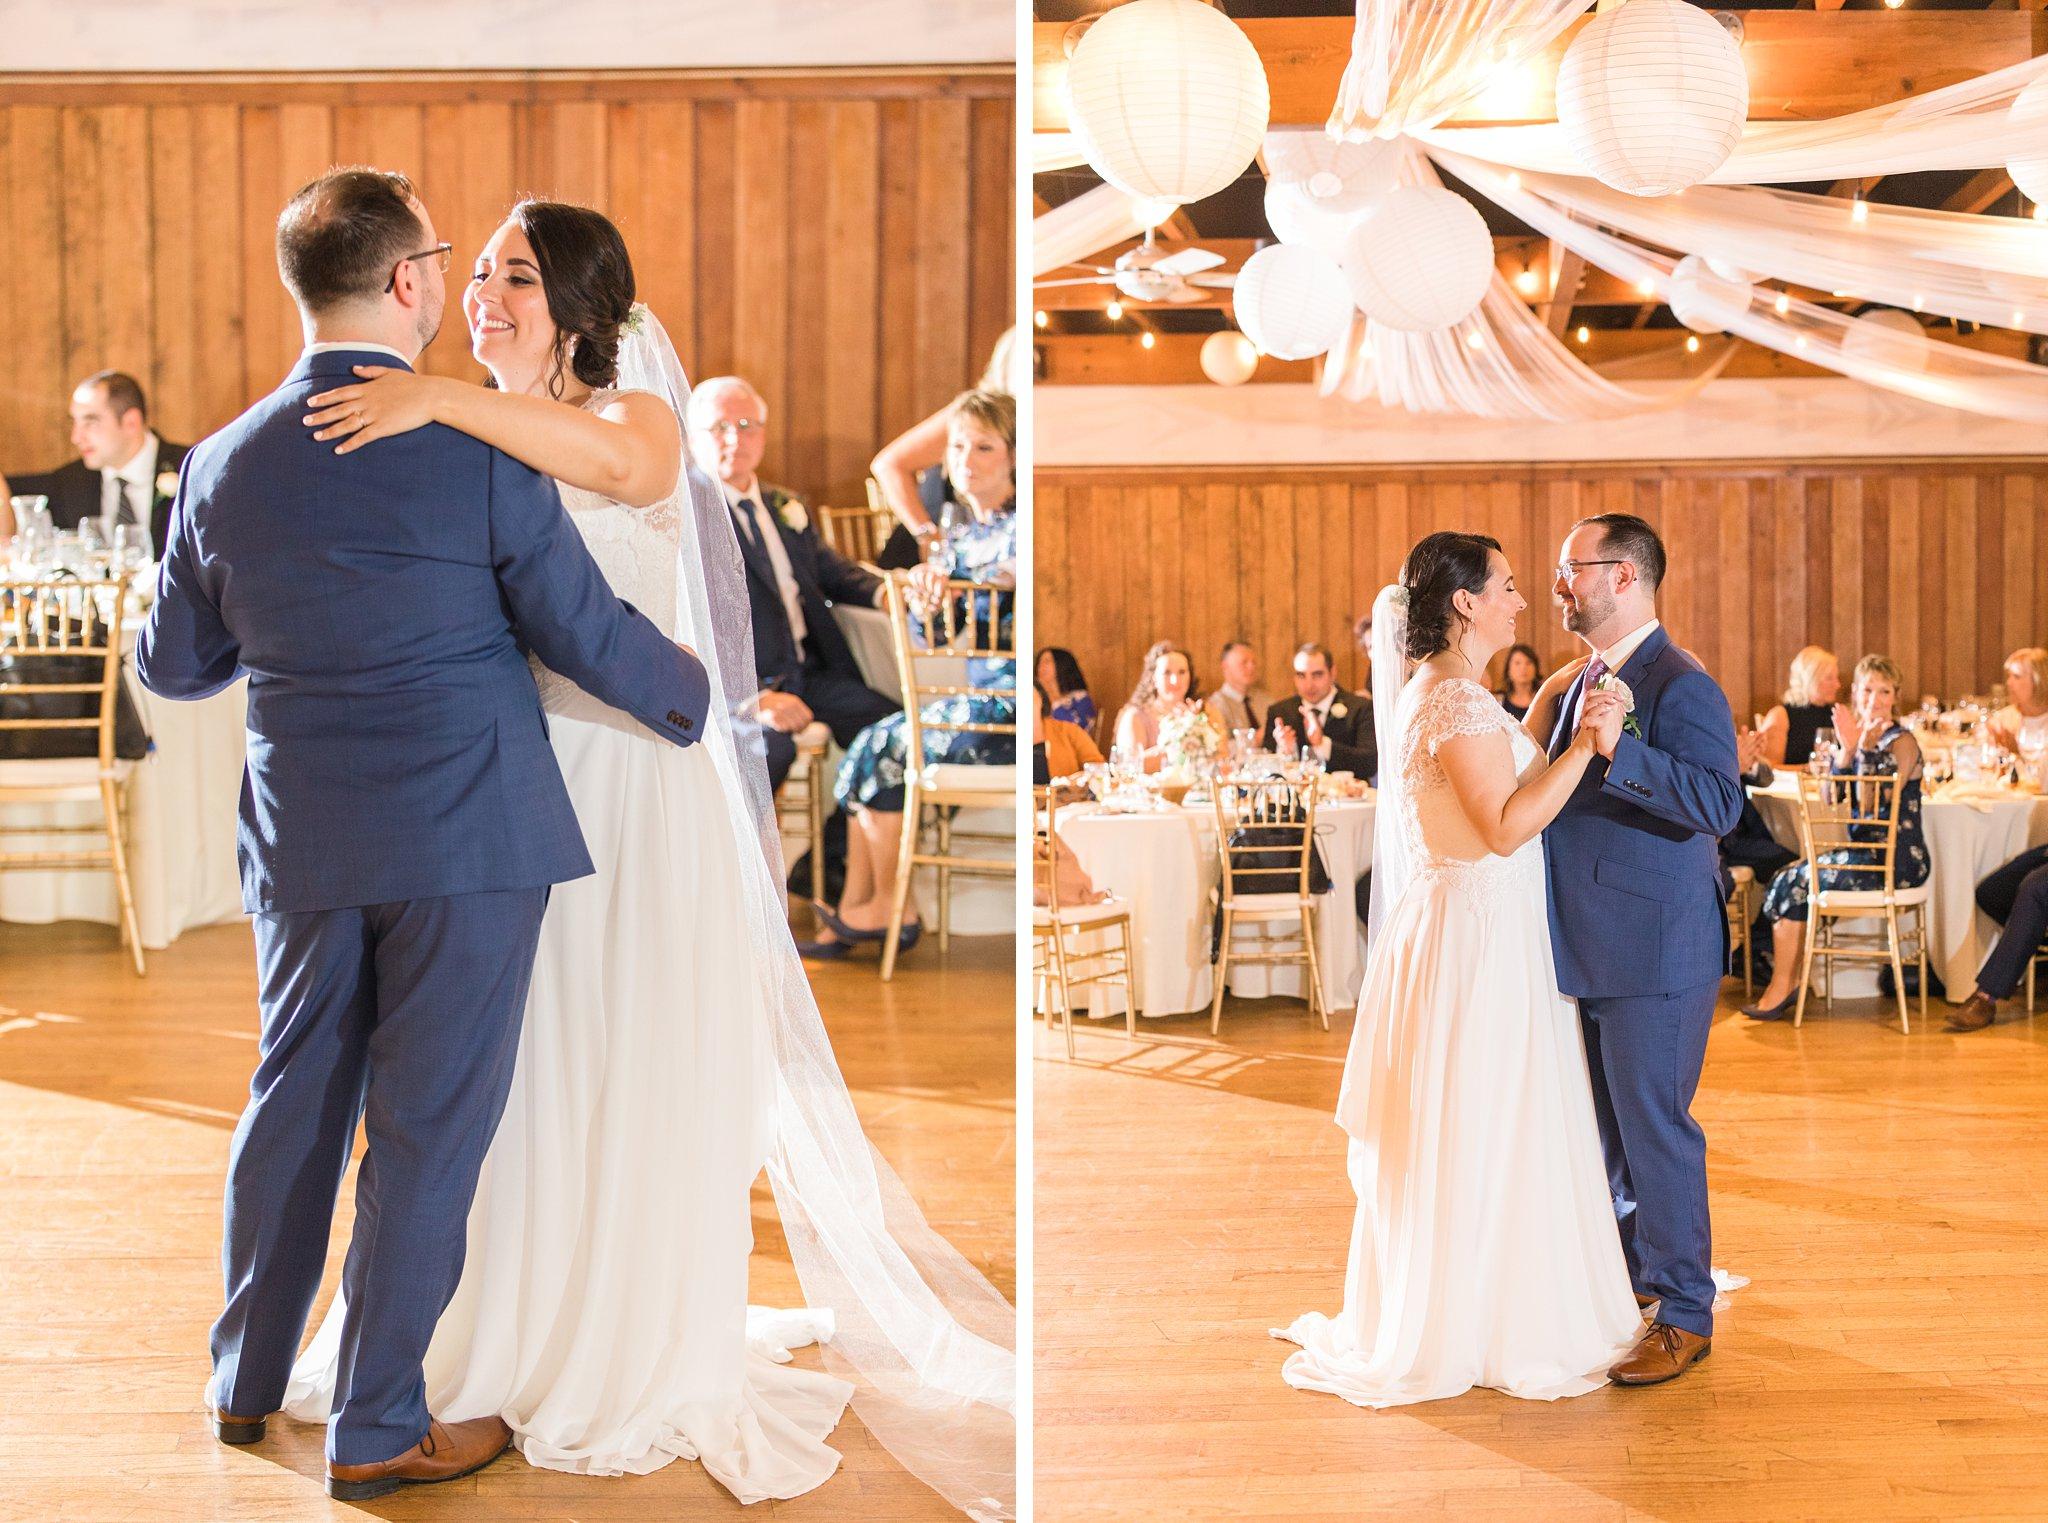 First dance, Britannia Yacht Club Wedding Photos, Amy Pinder Photography